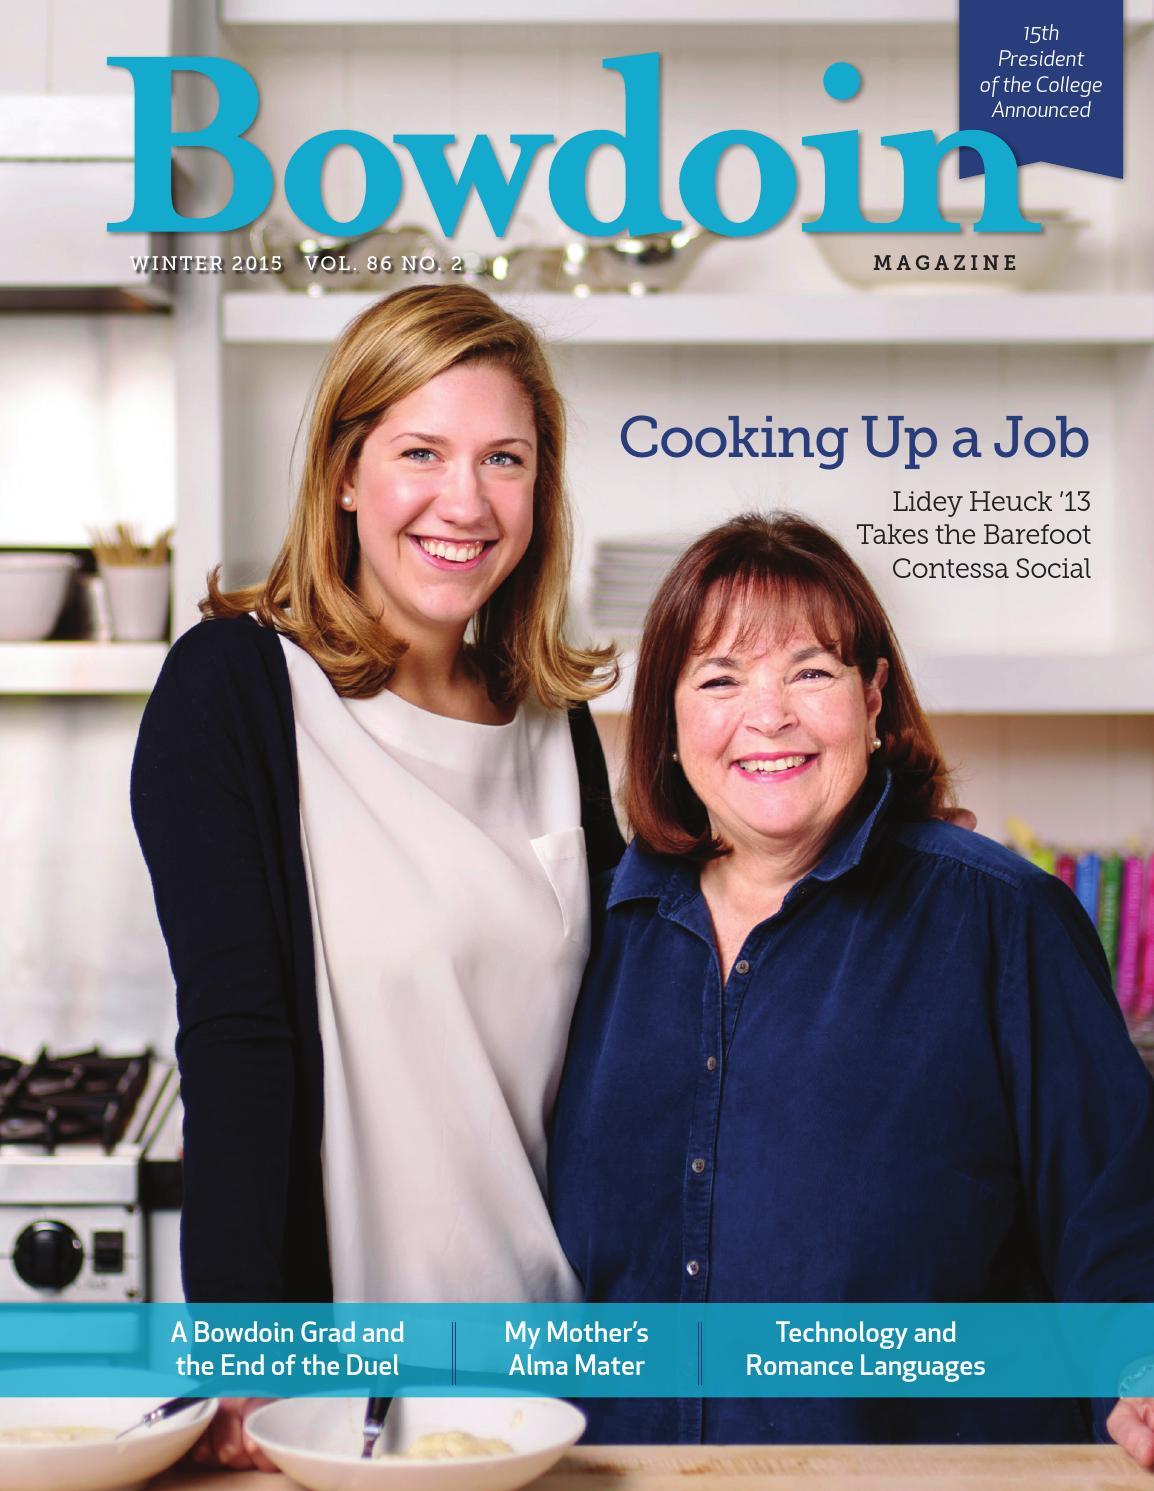 bowdoin magazine vol 86 no 2 winter 2015 by bowdoin magazine